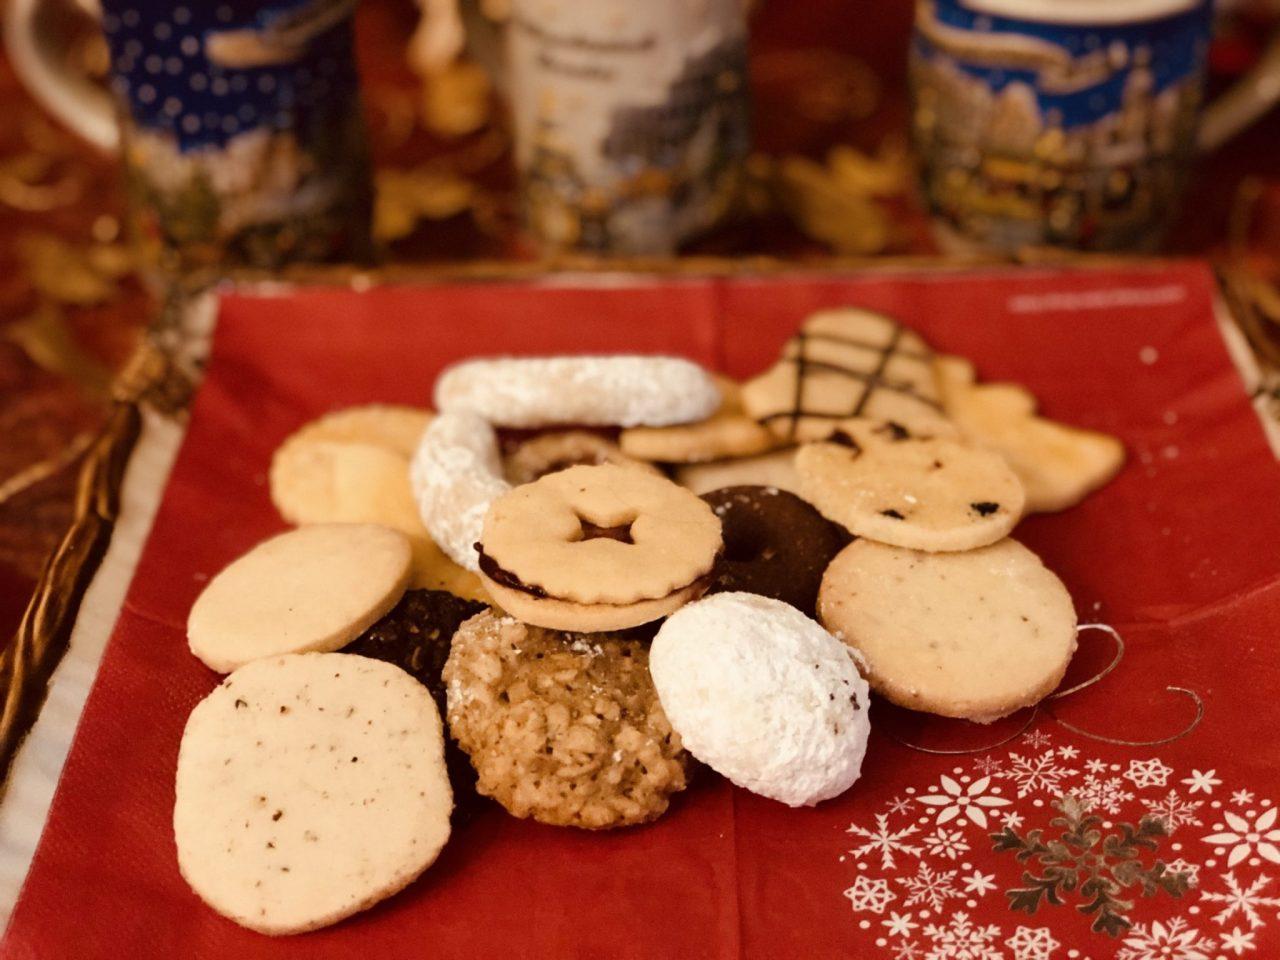 Christmas cookies, Weihnachtsplätzchen